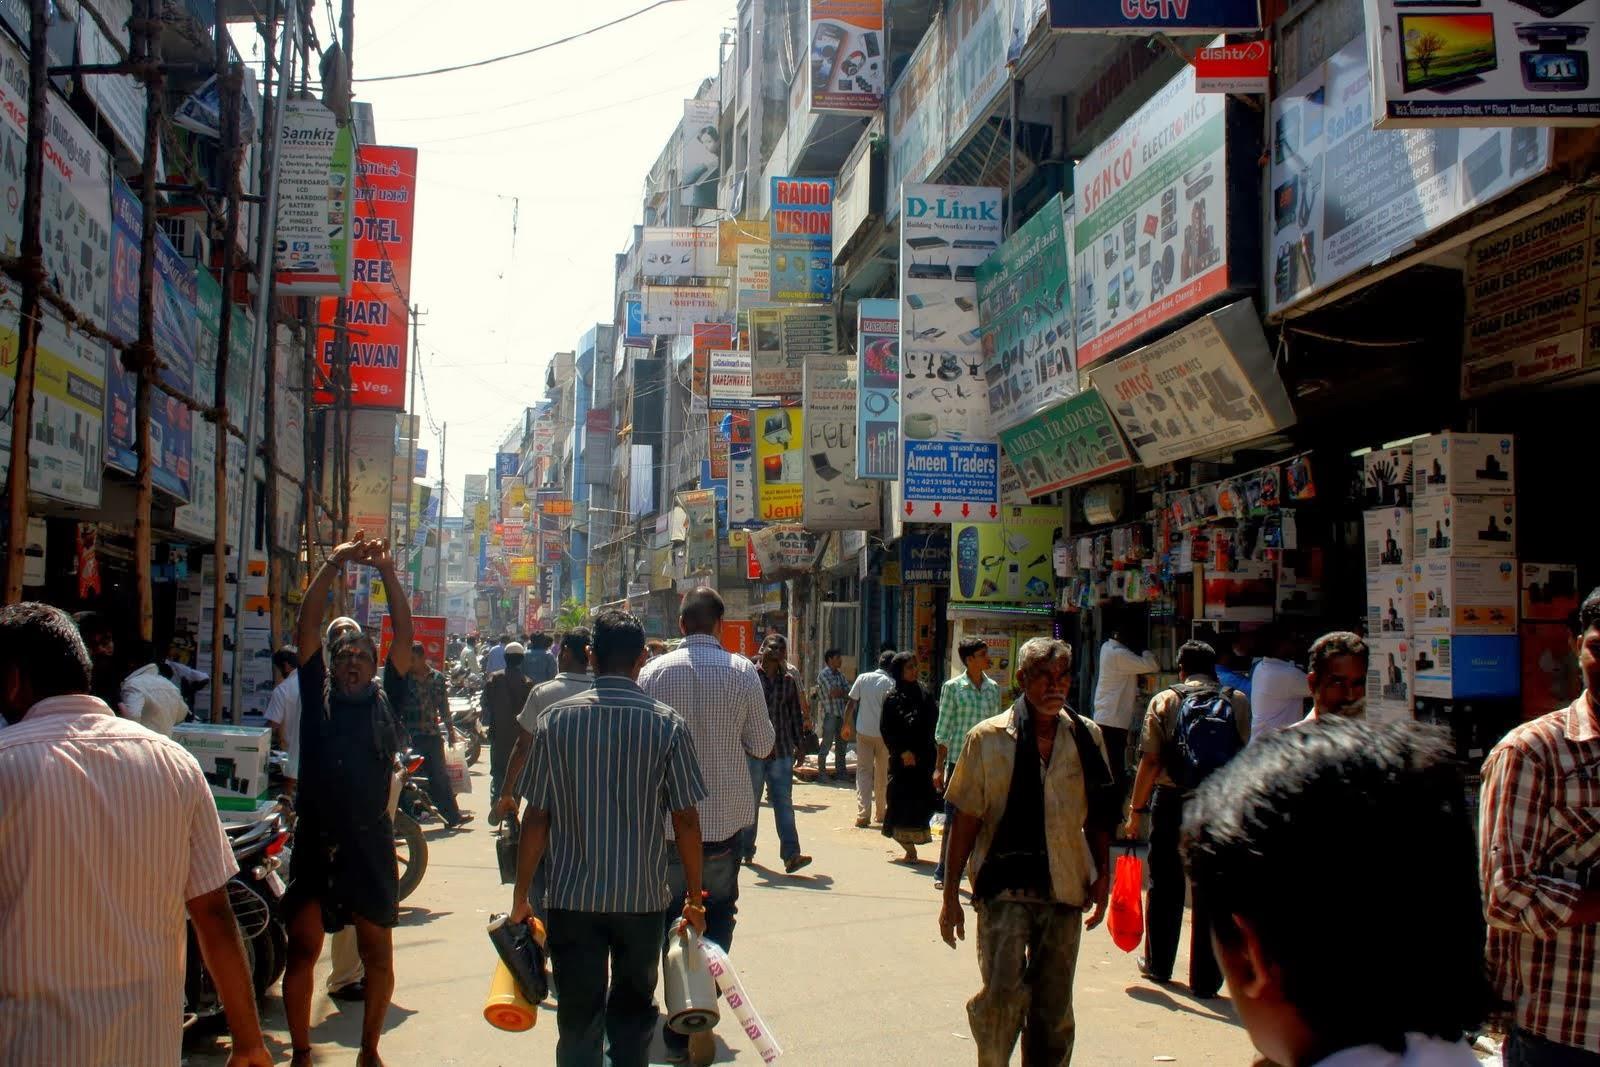 Ritchie Street - Chennai Image